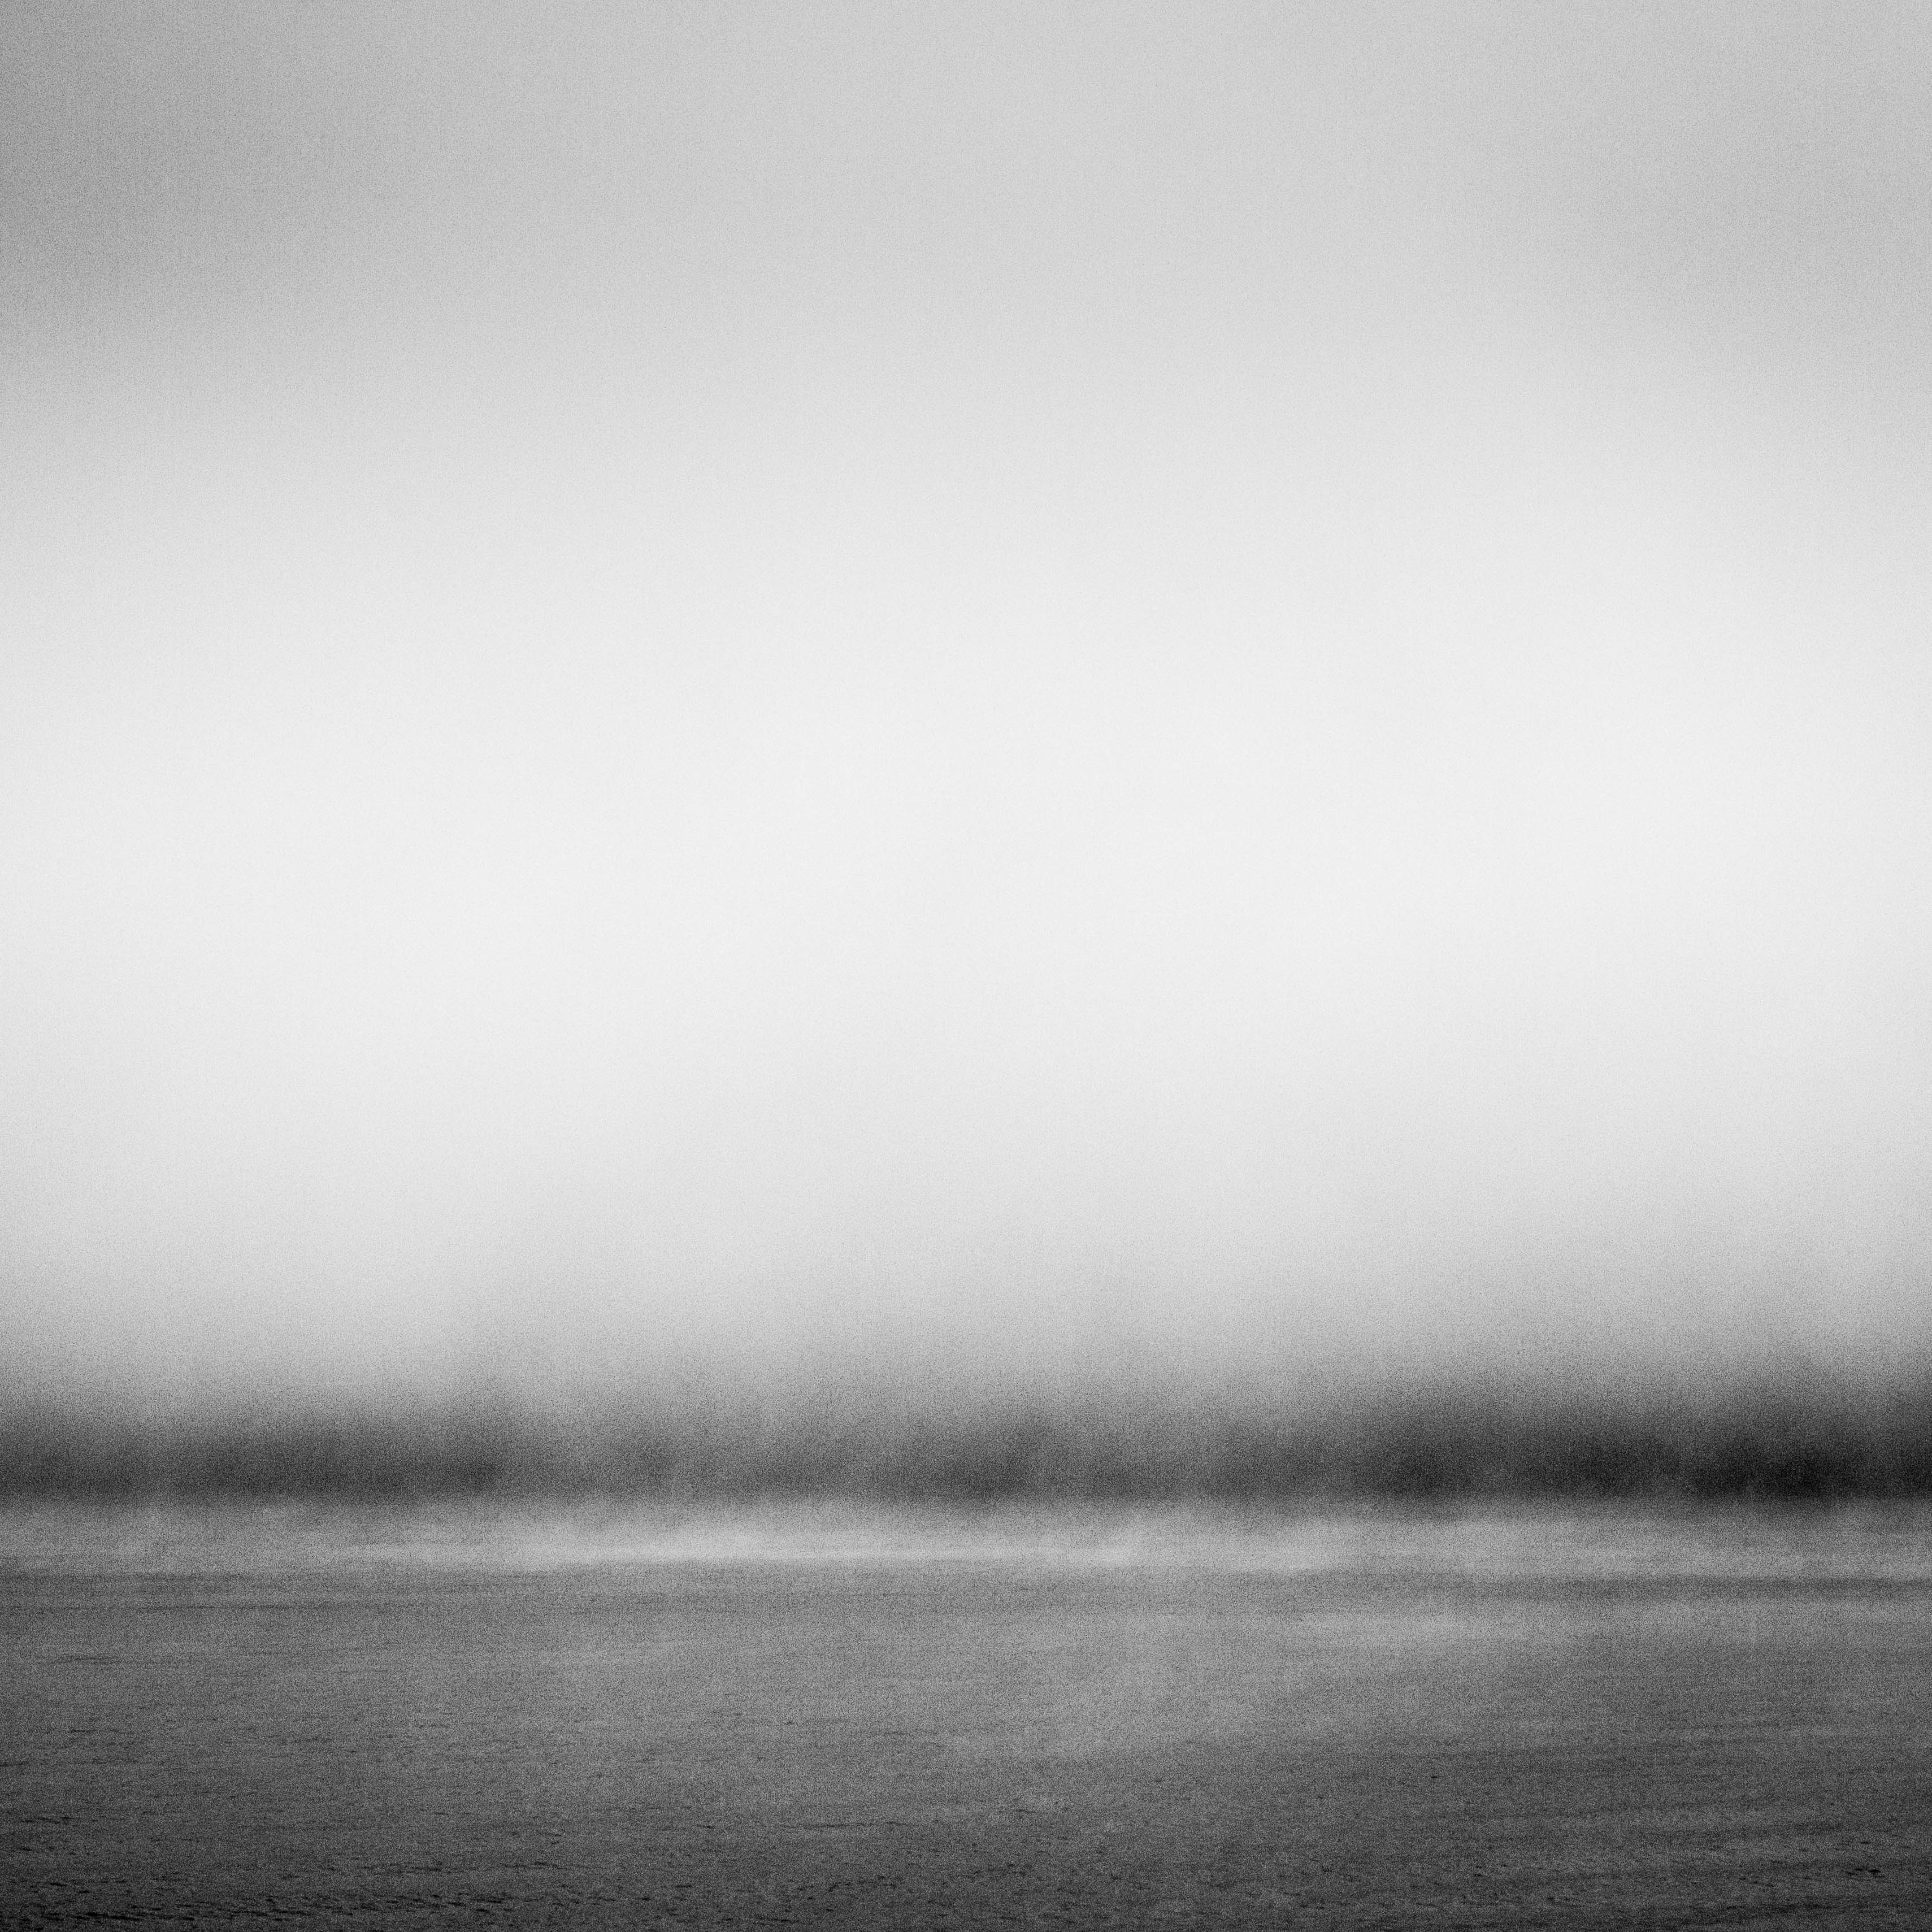 Entering the Fog. 2016.